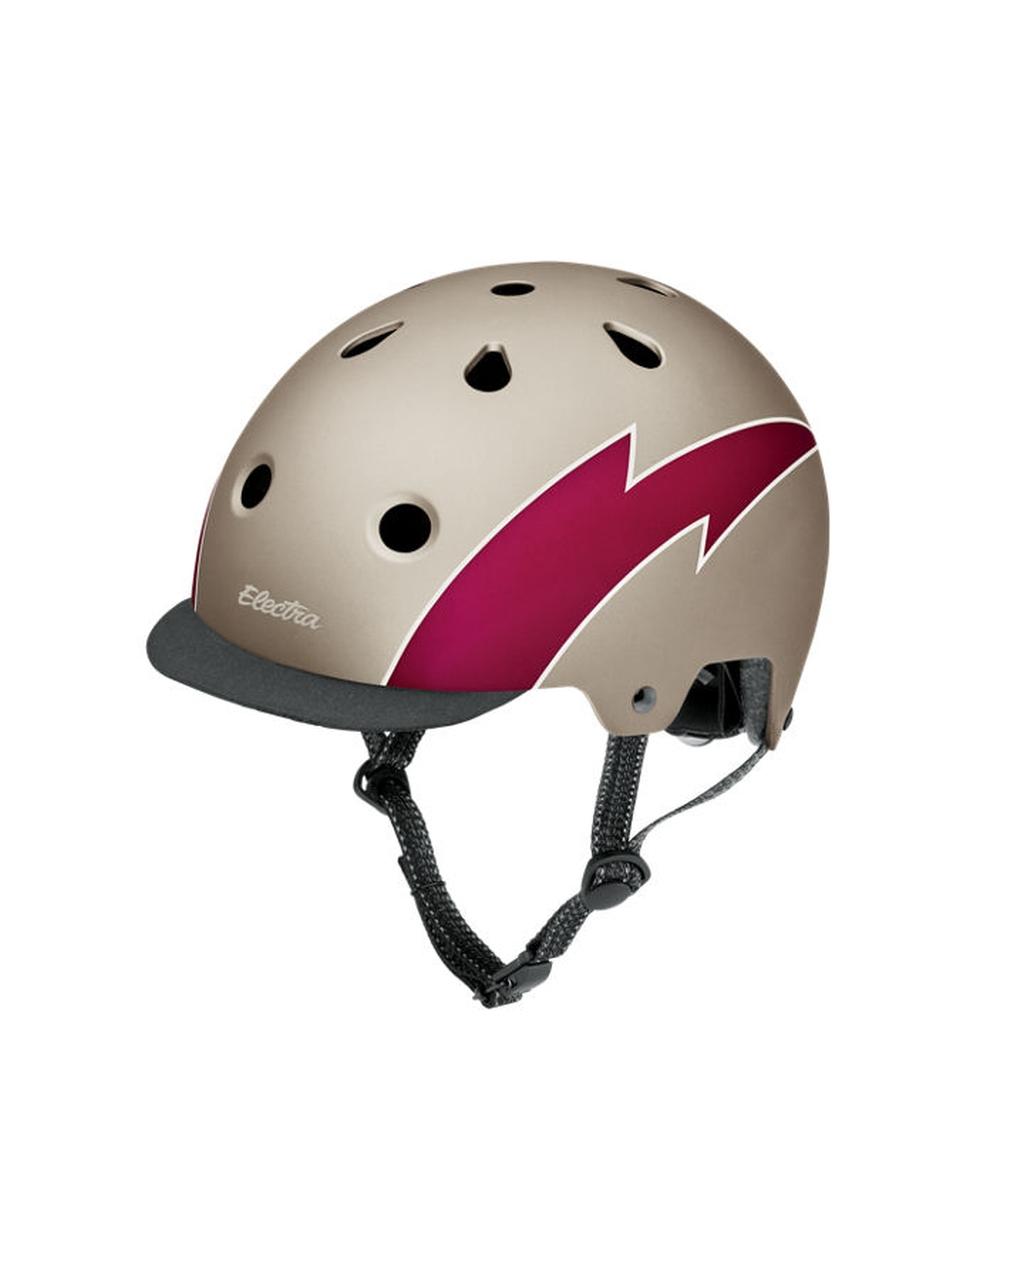 Electra - Bike Helmet - Lightning